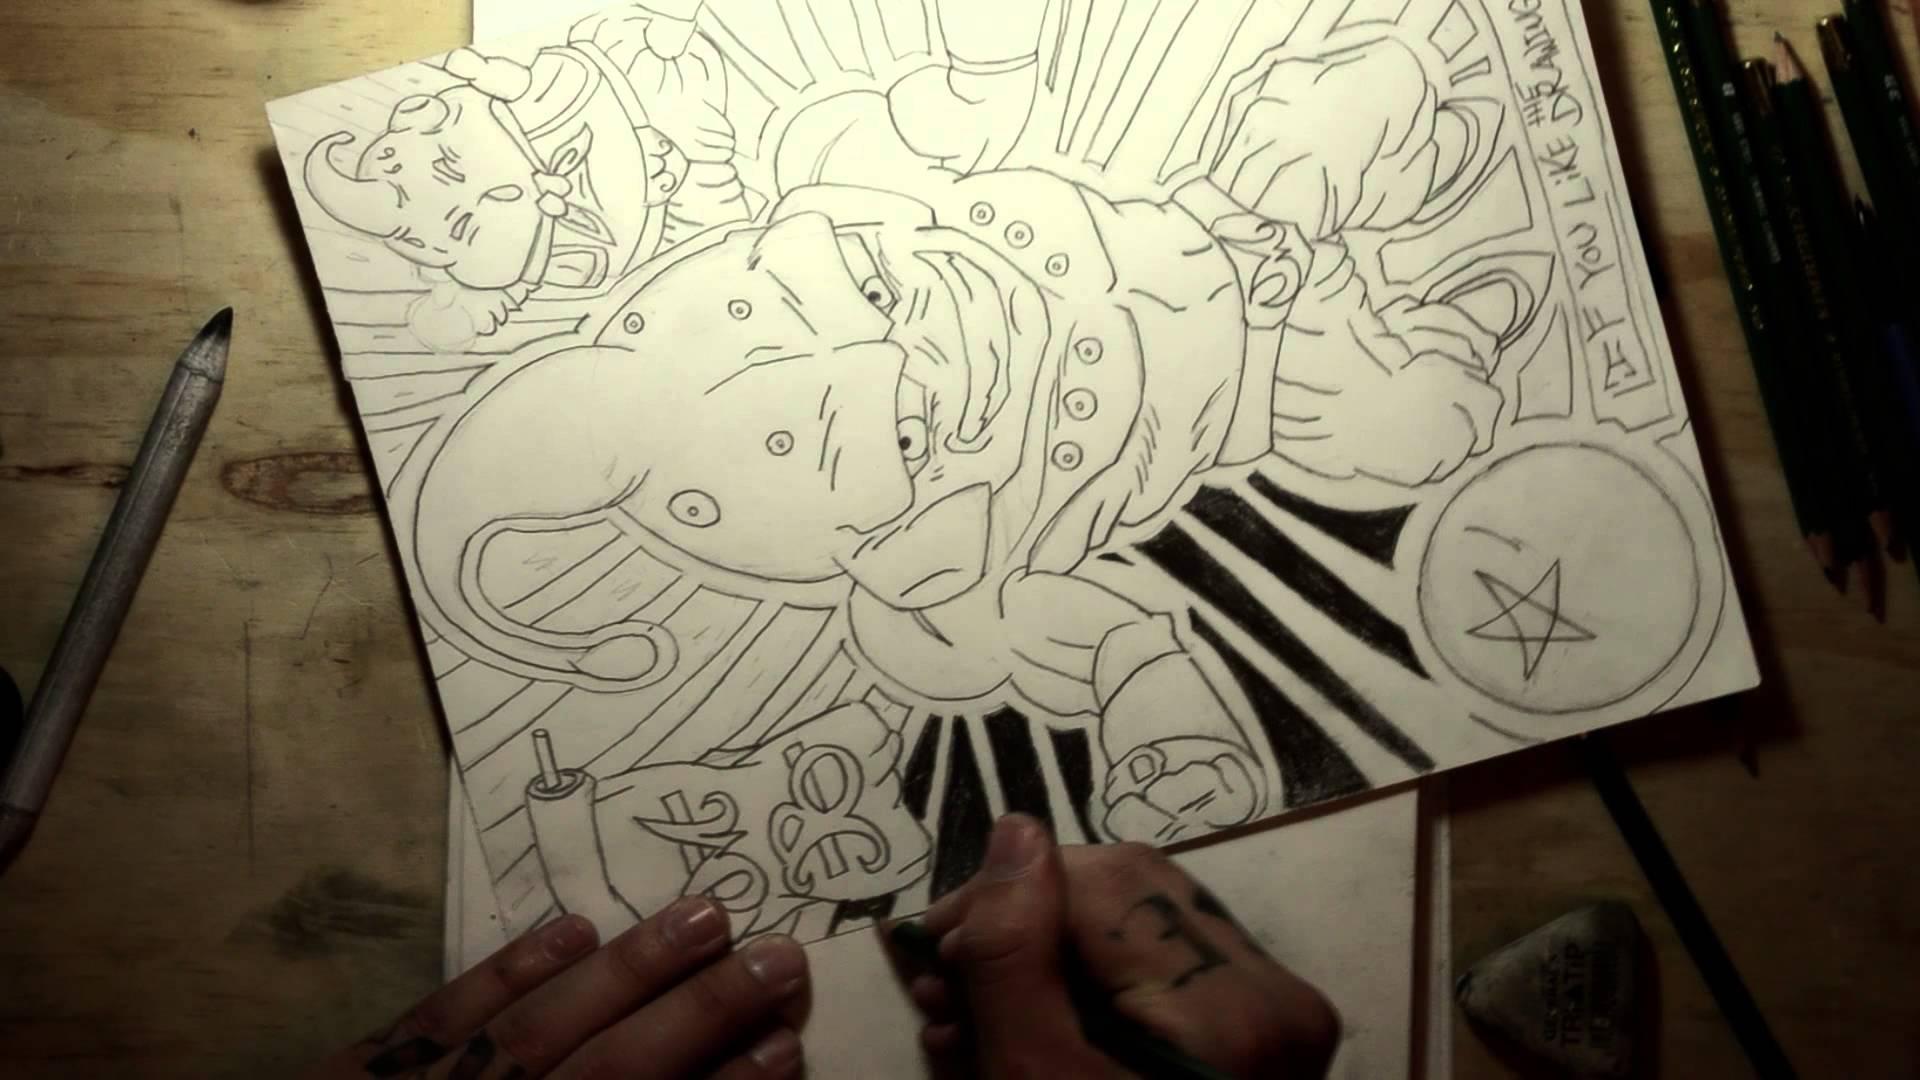 1920x1080 Drawing Ideas Dragon Ball Z Majin Buu, Bluddy Pencil Style